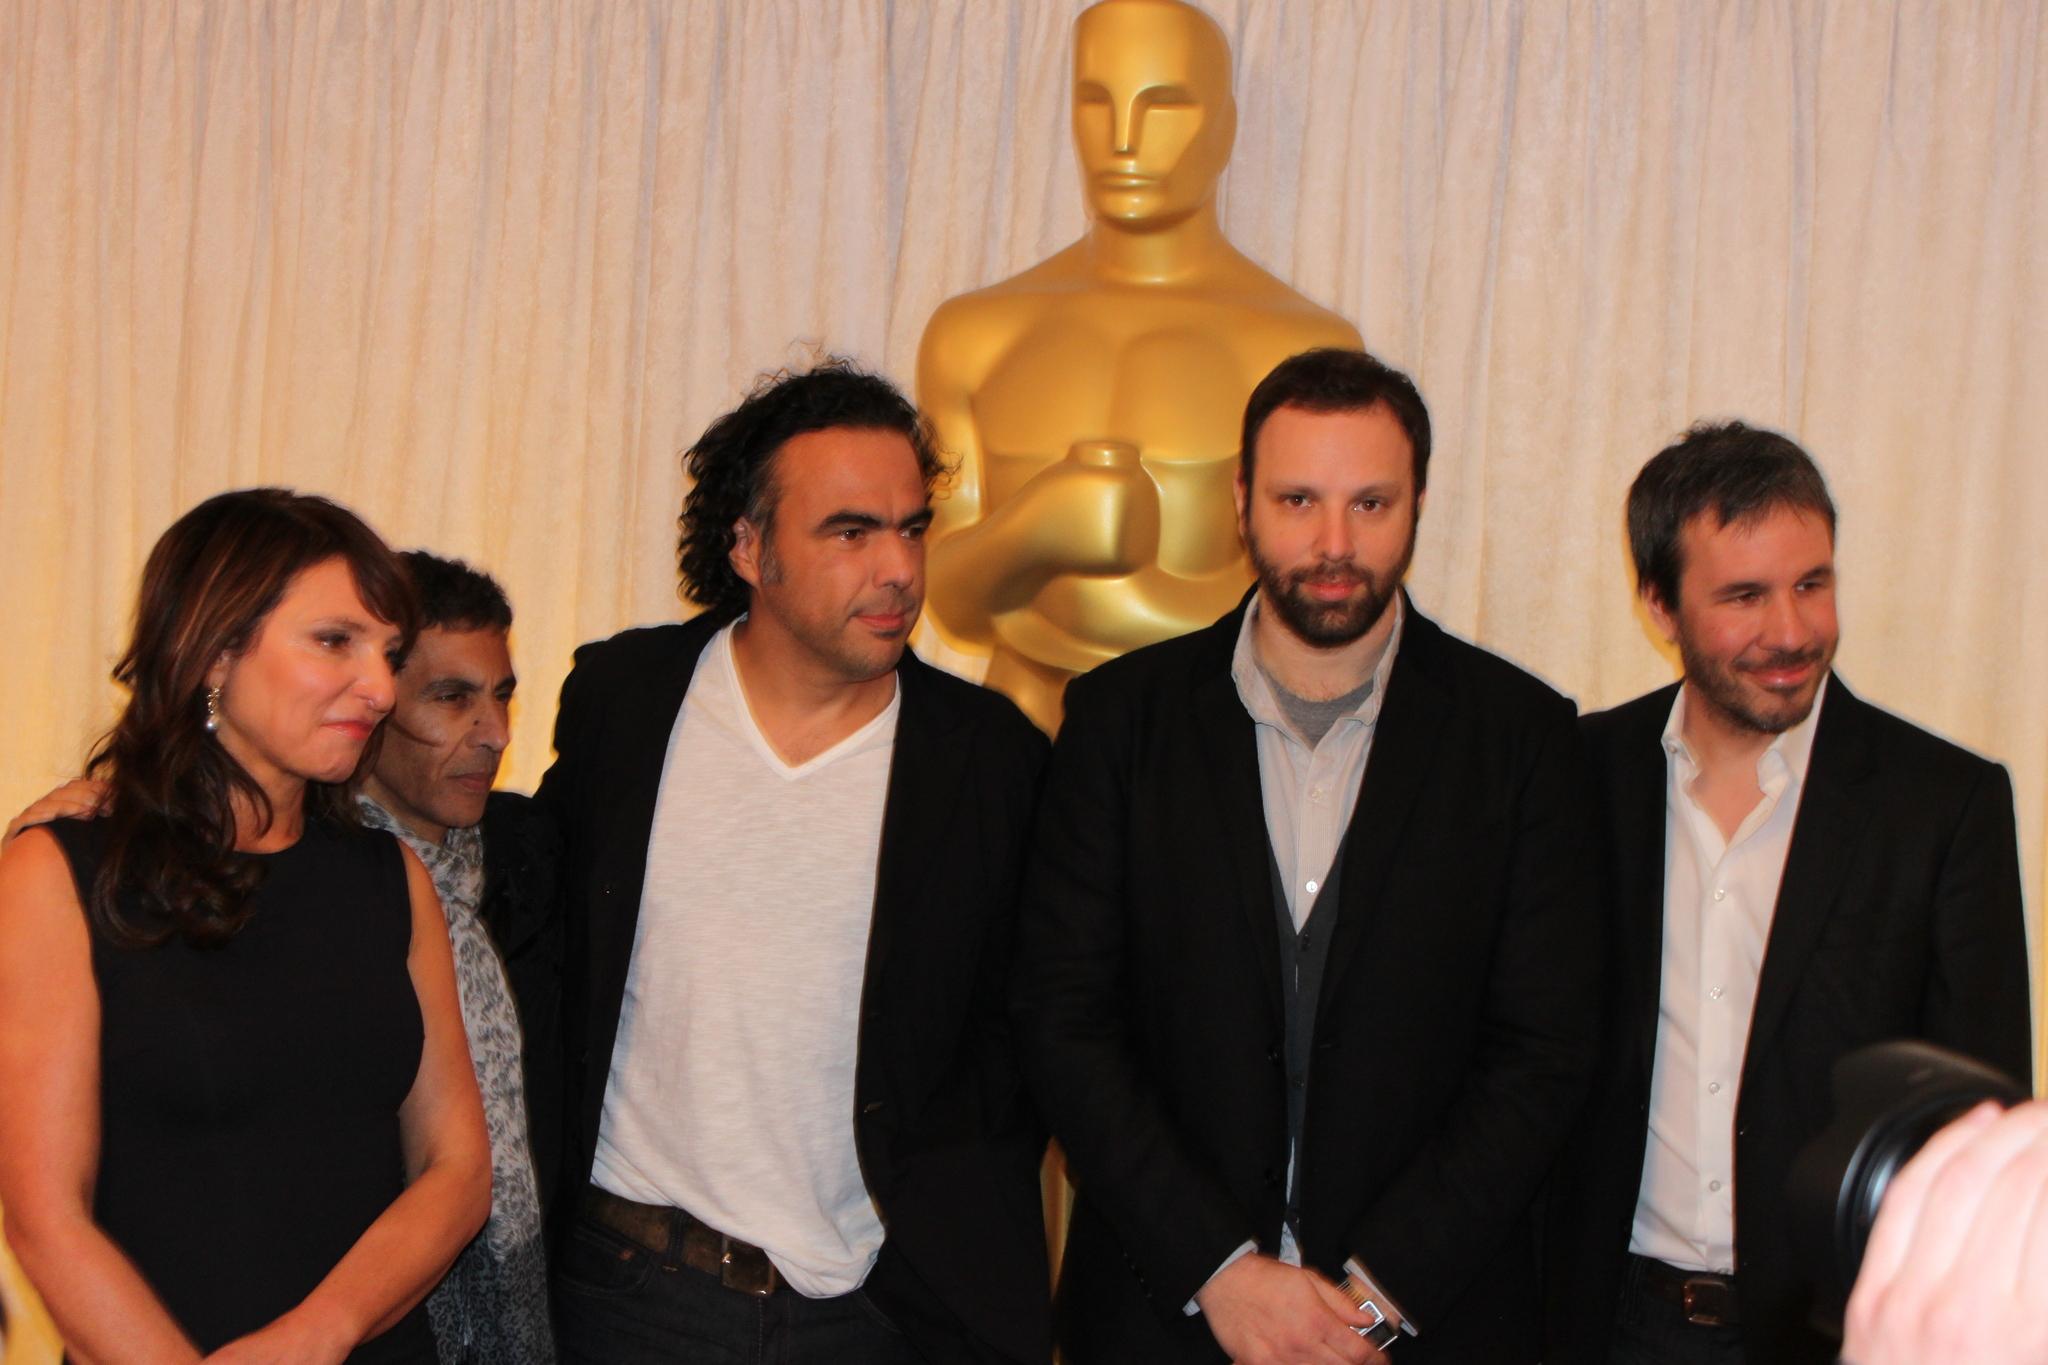 Susanne Bier, Rachid Bouchareb, Alejandro G. Iñárritu, Yorgos Lanthimos, and Denis Villeneuve